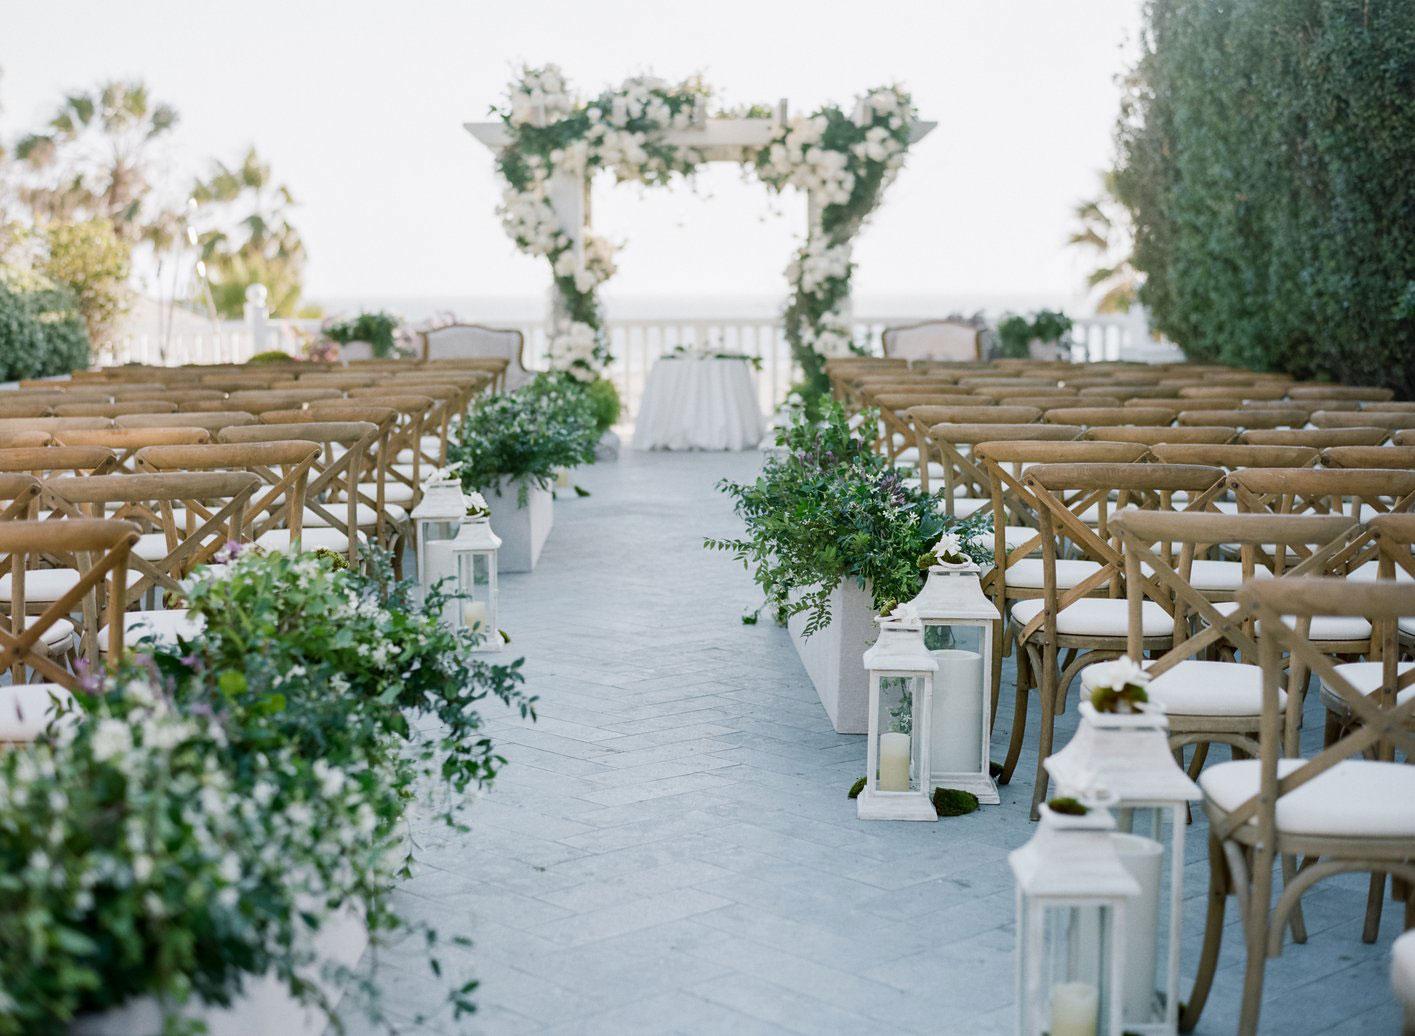 Photo via  Inside Weddings